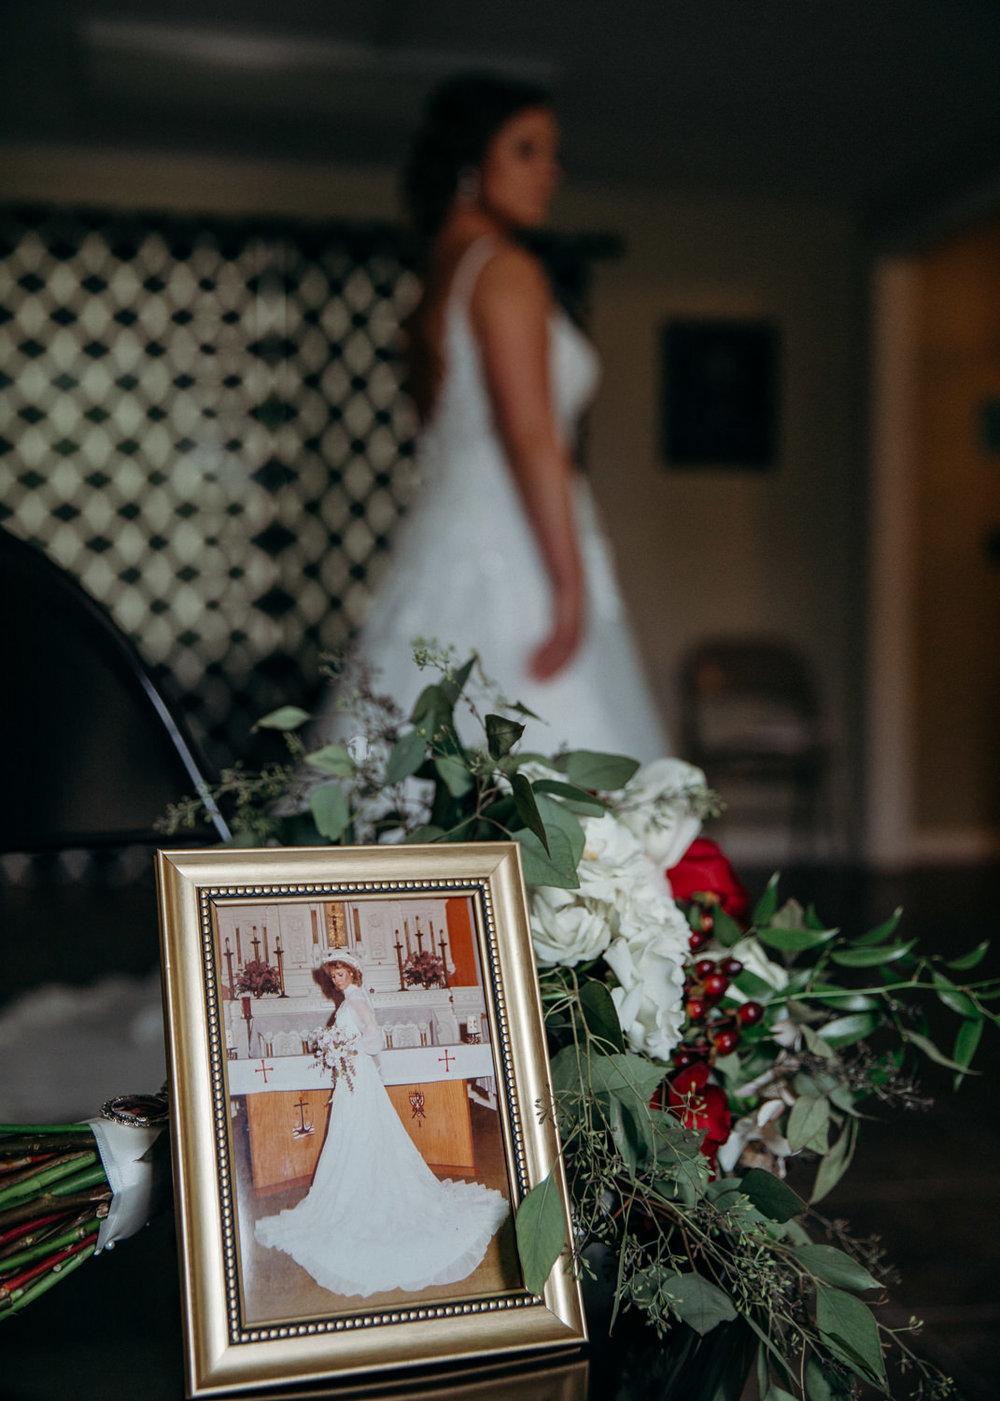 Chase and Chelsea wedding blog photography grant beachy elkhart south bend goshen -012.jpg